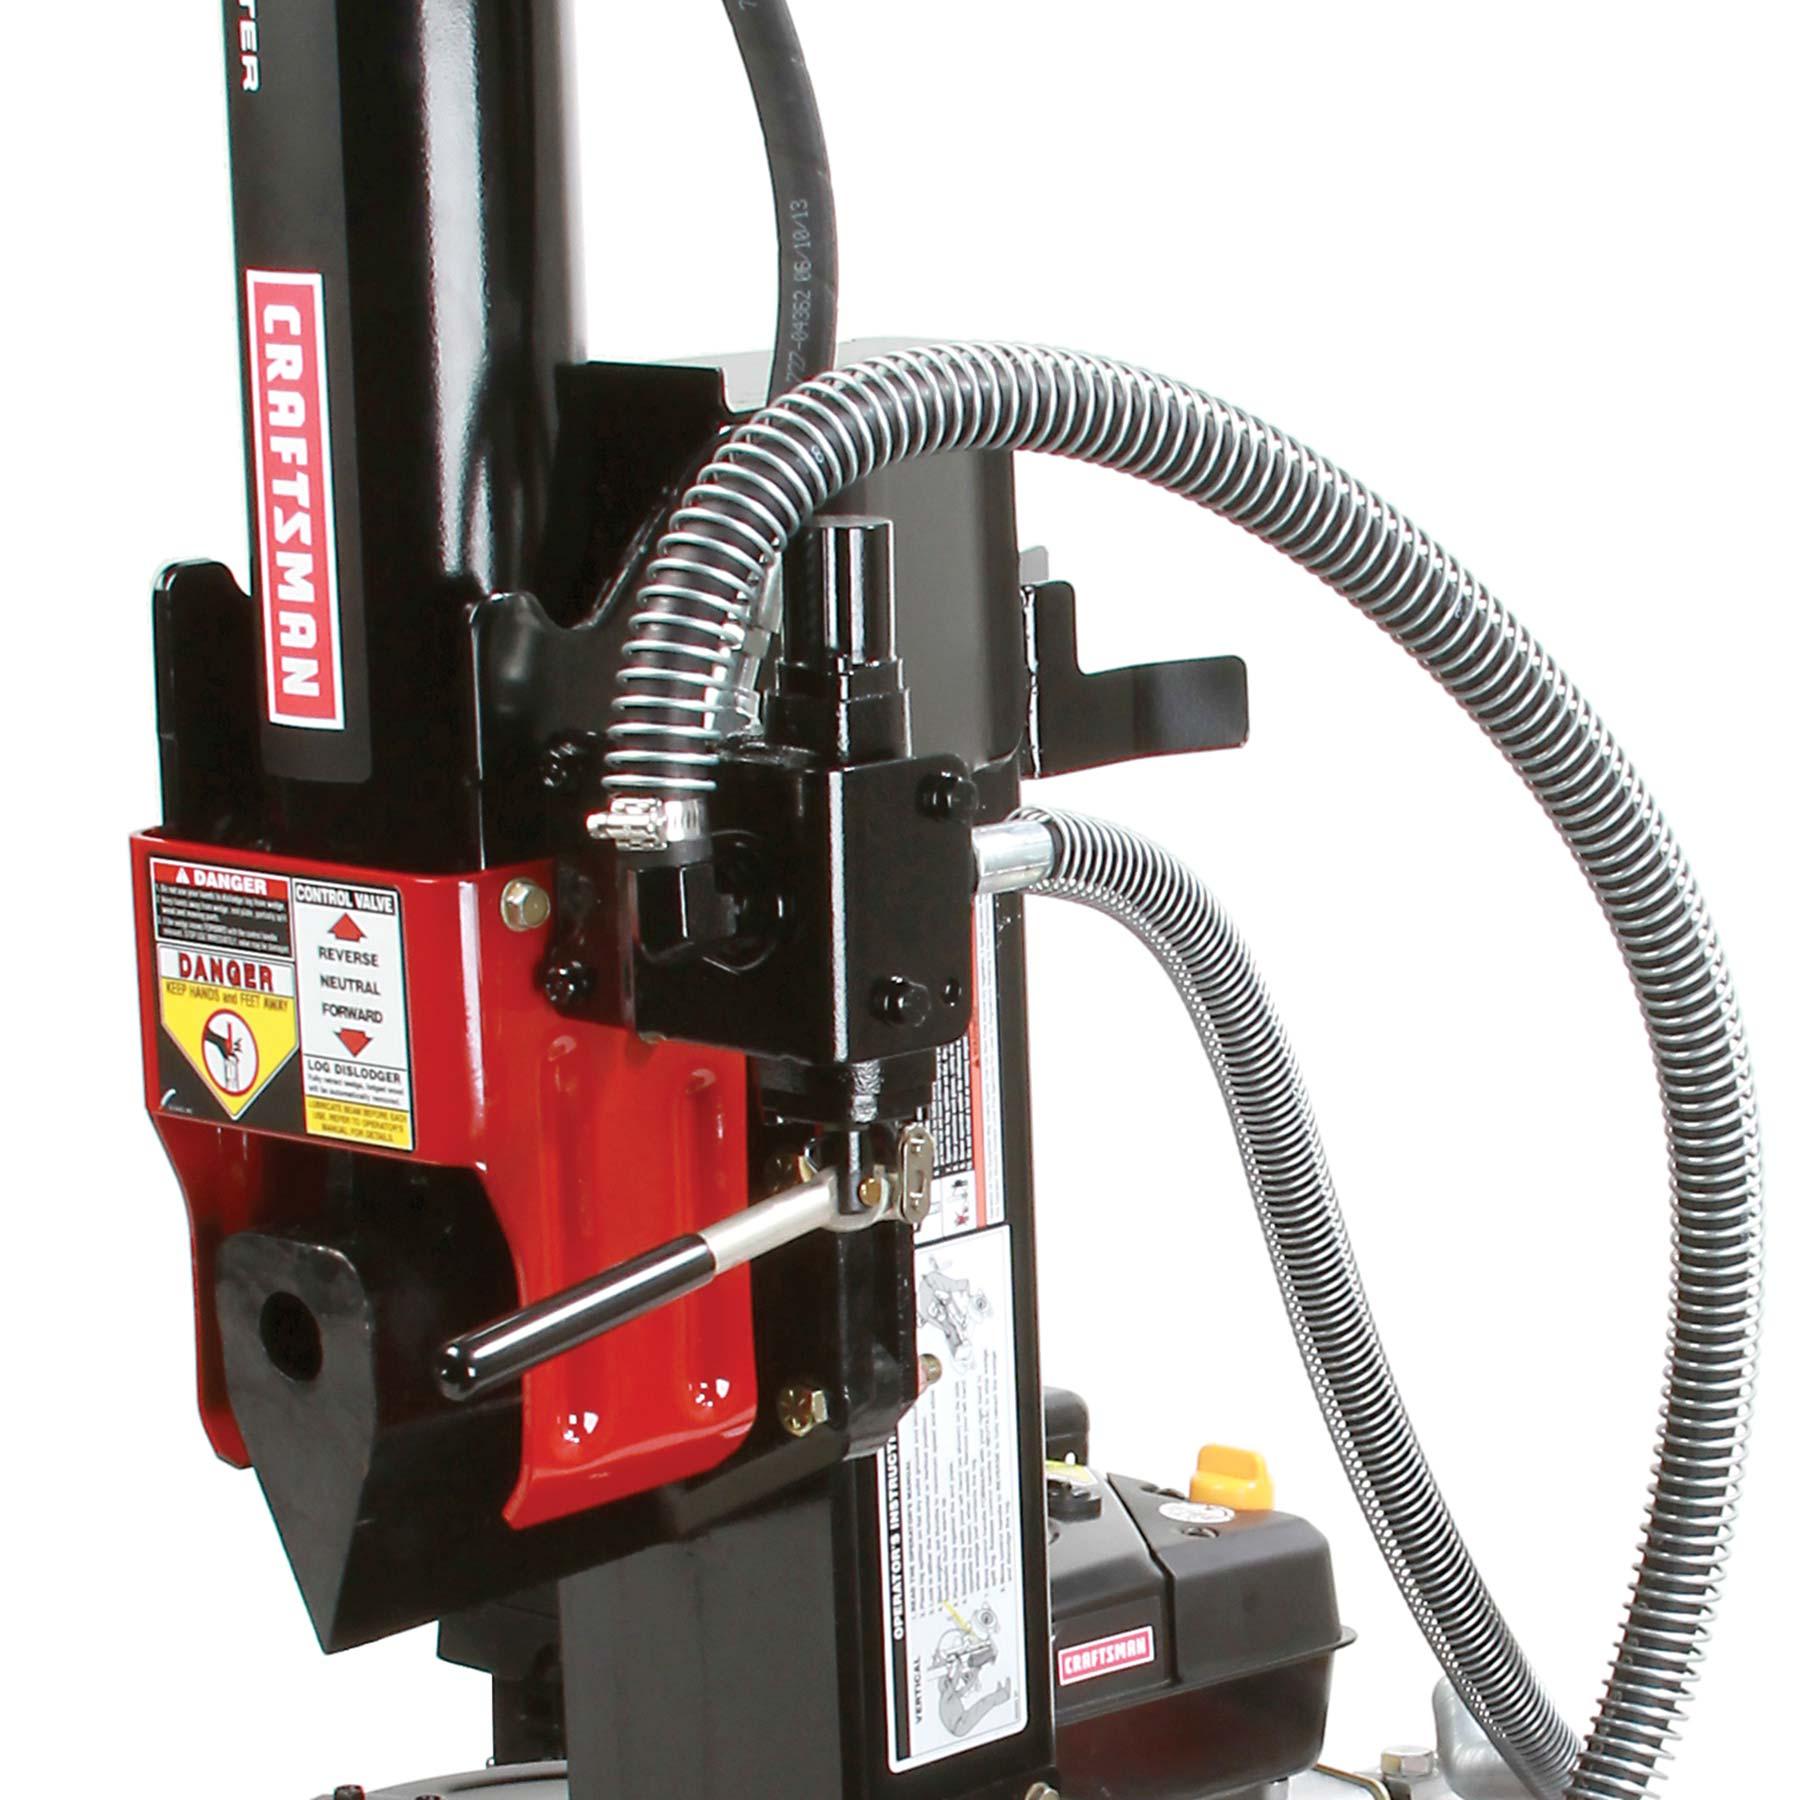 Craftsman 208cc 27-Ton Log Splitter